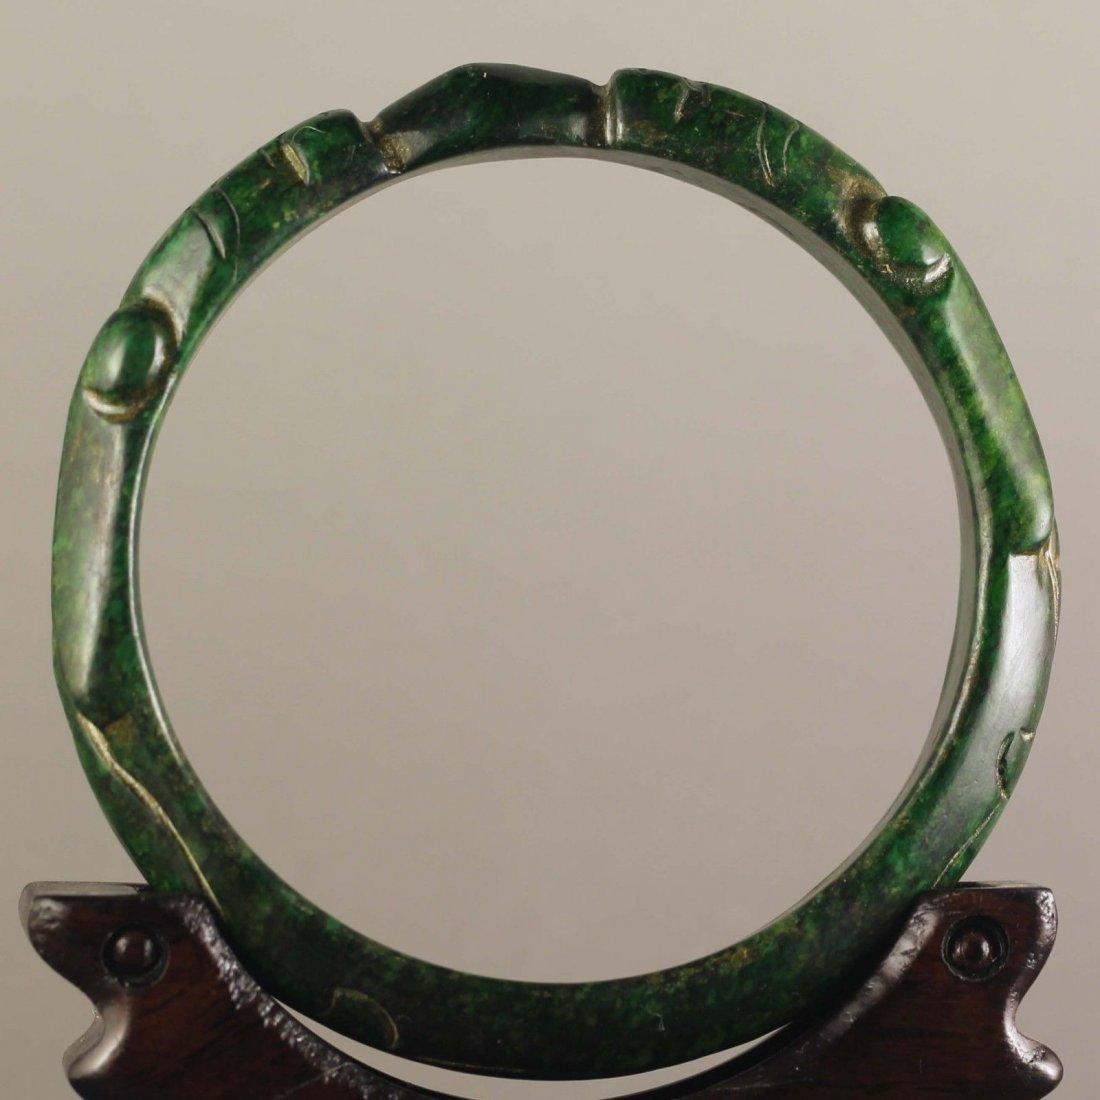 Chinese old natural jade hand-carved Dragons Bangle - 2